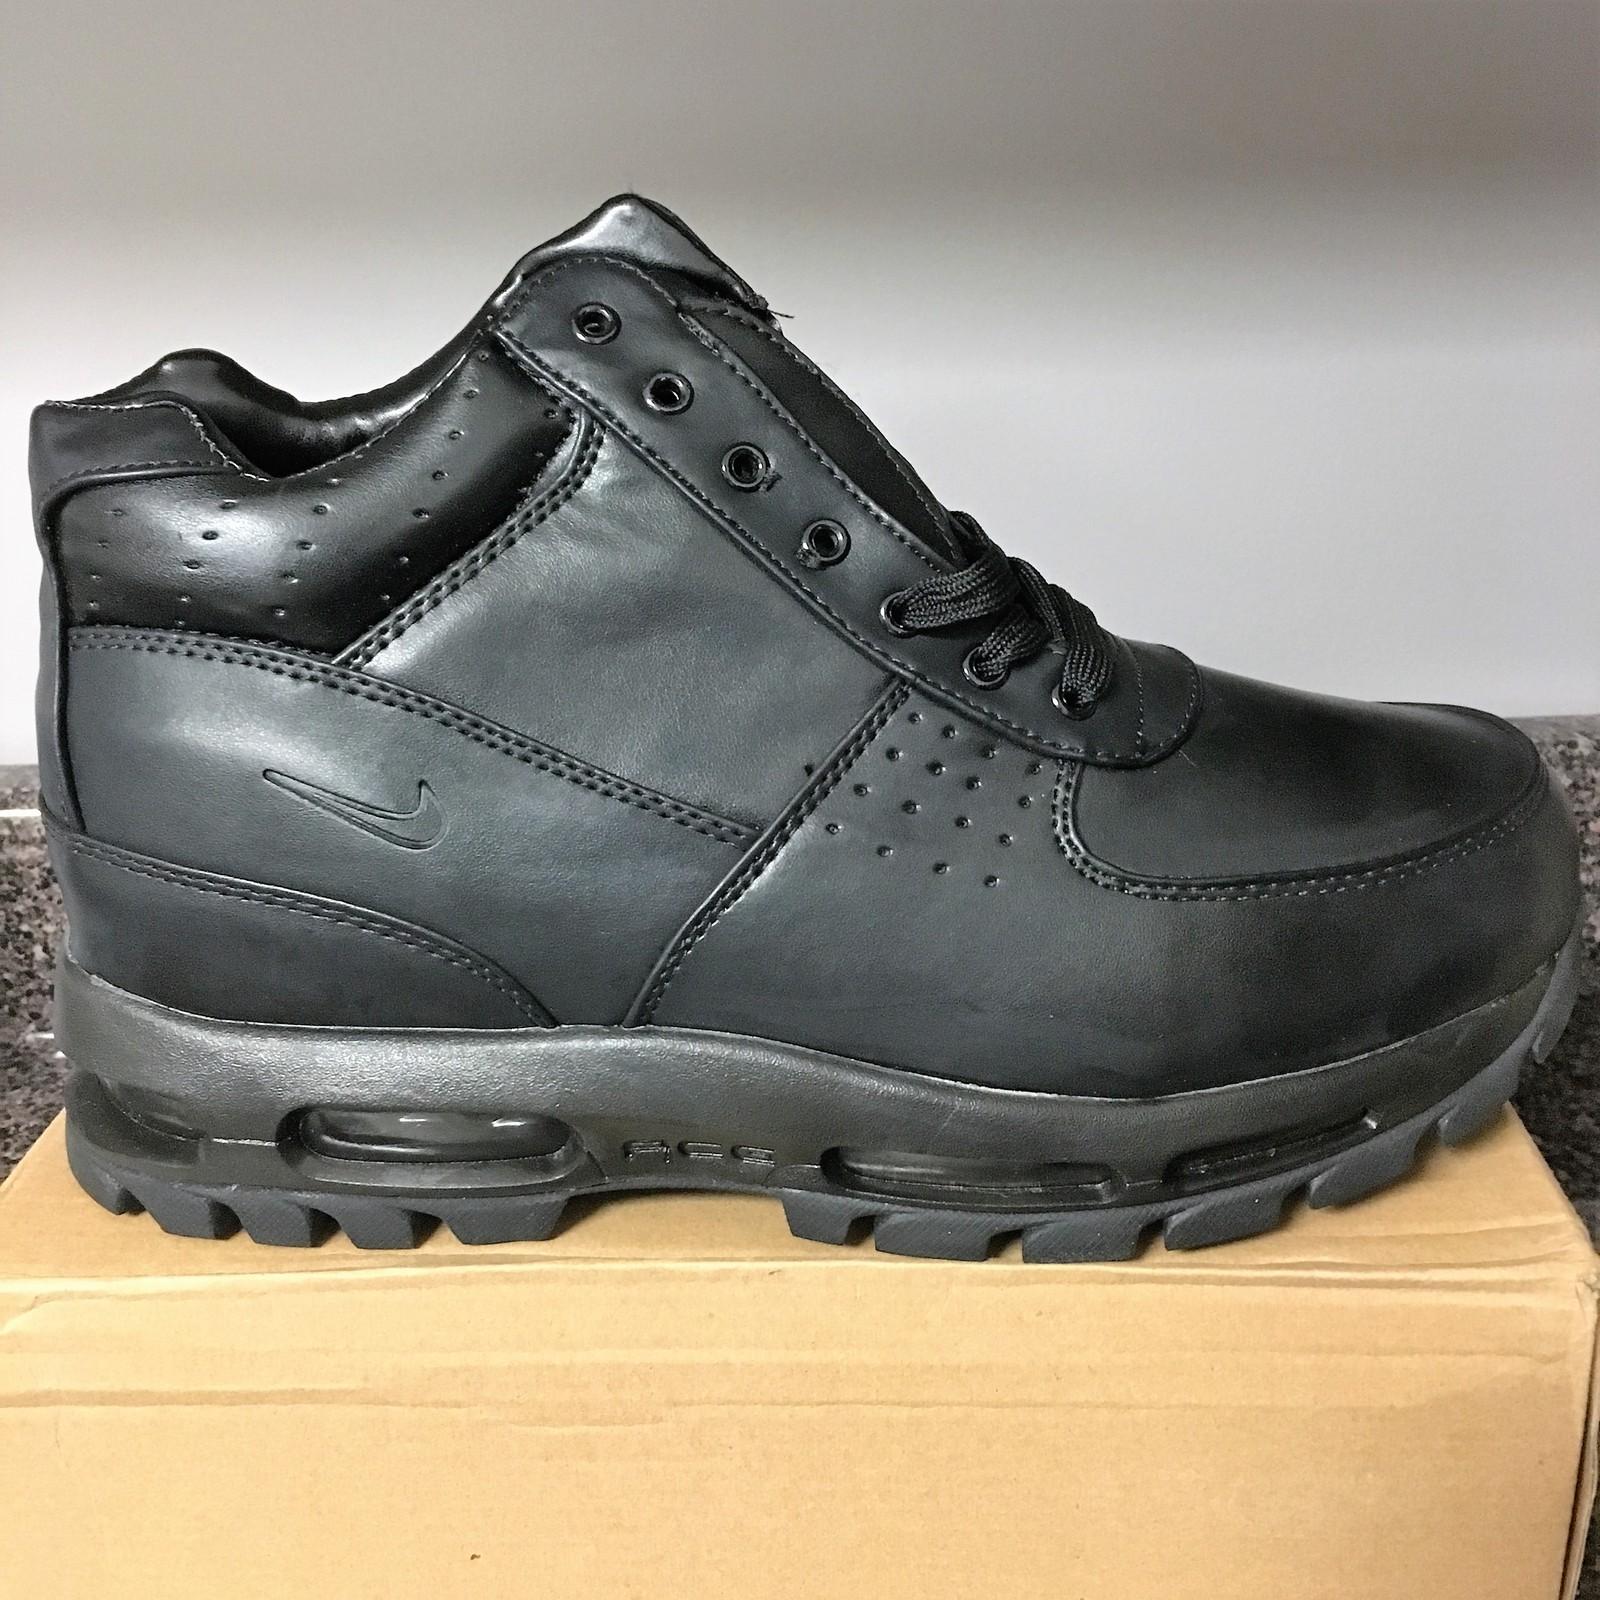 reputable site e33f7 9f9ad Mens Nike ACG Goadome Boots sz 9 and 50 similar items. Img 0667